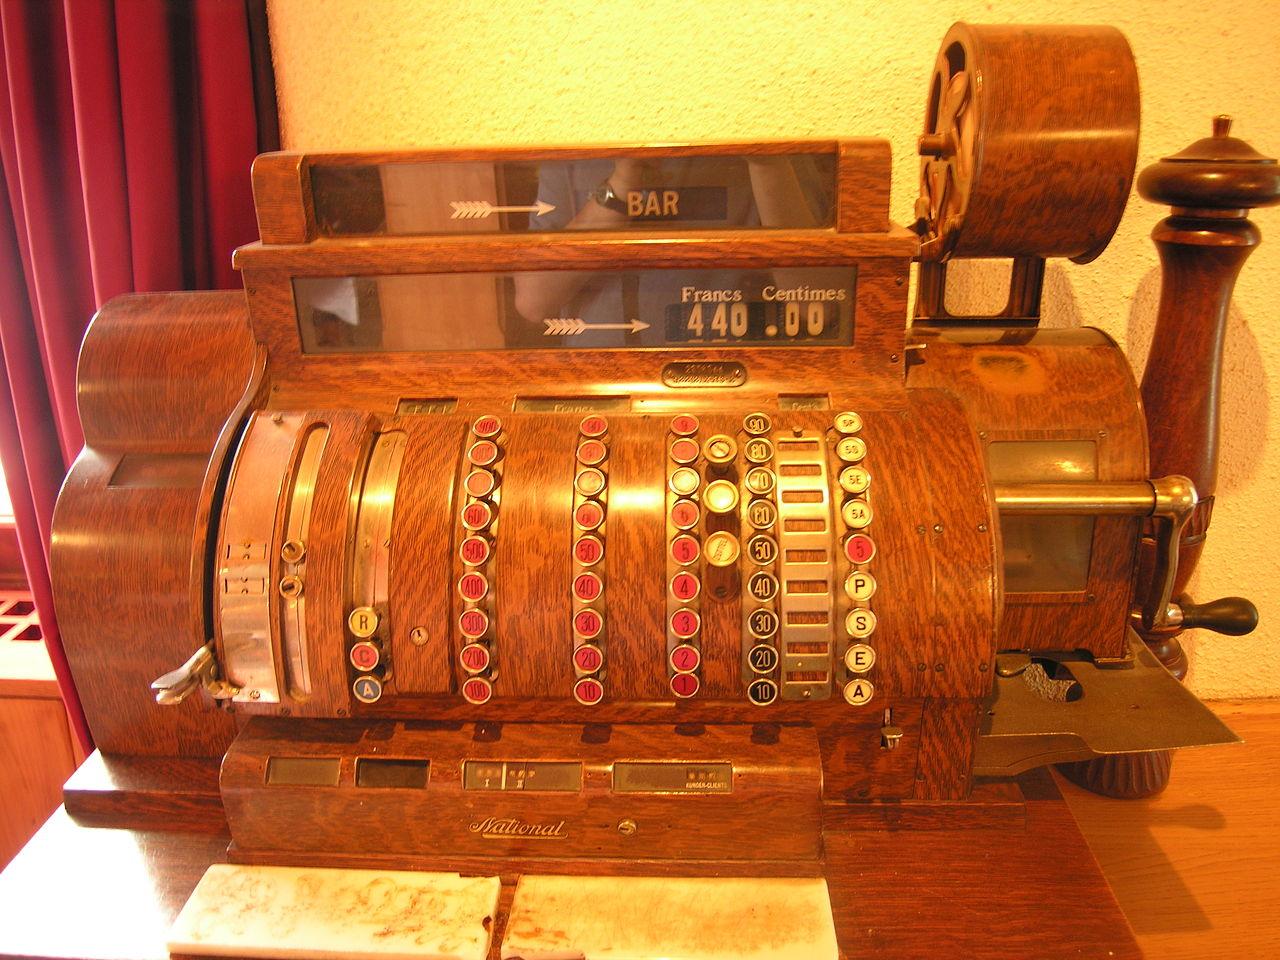 knappekasse, gammel kassaapparat, POS system, pos, kasseapparat